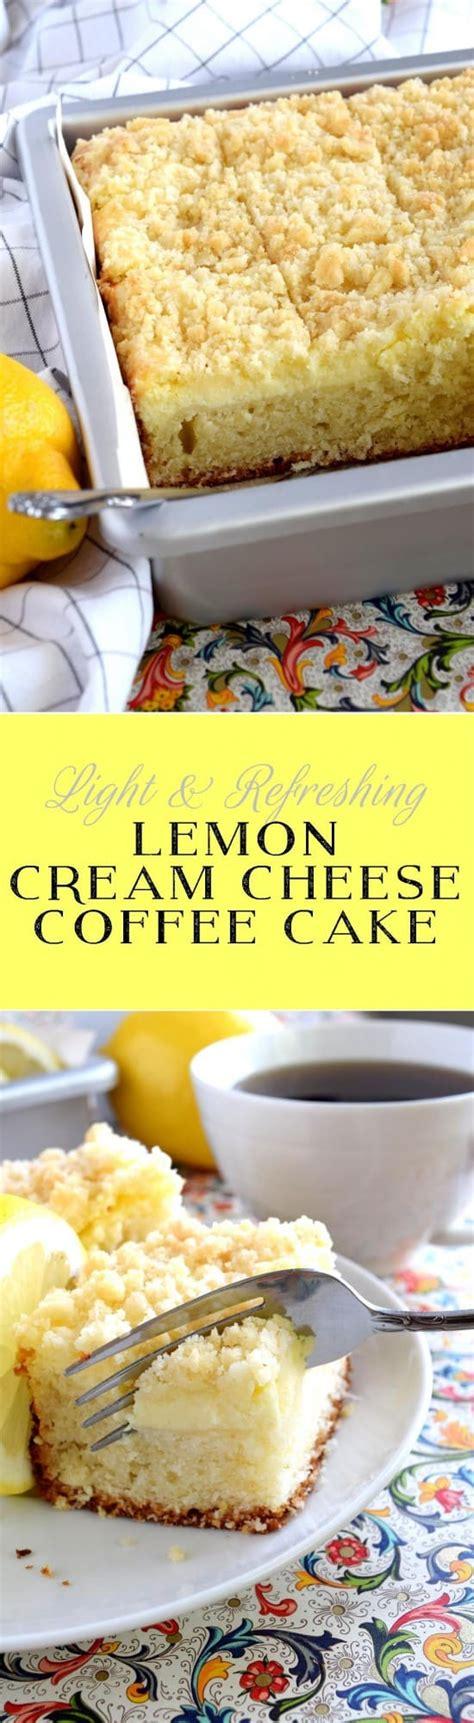 Coffee cake, lemon coffee cake, lemon cream cheese coffee cake. Lemon Cream Cheese Coffee Cake - Lord Byron's Kitchen